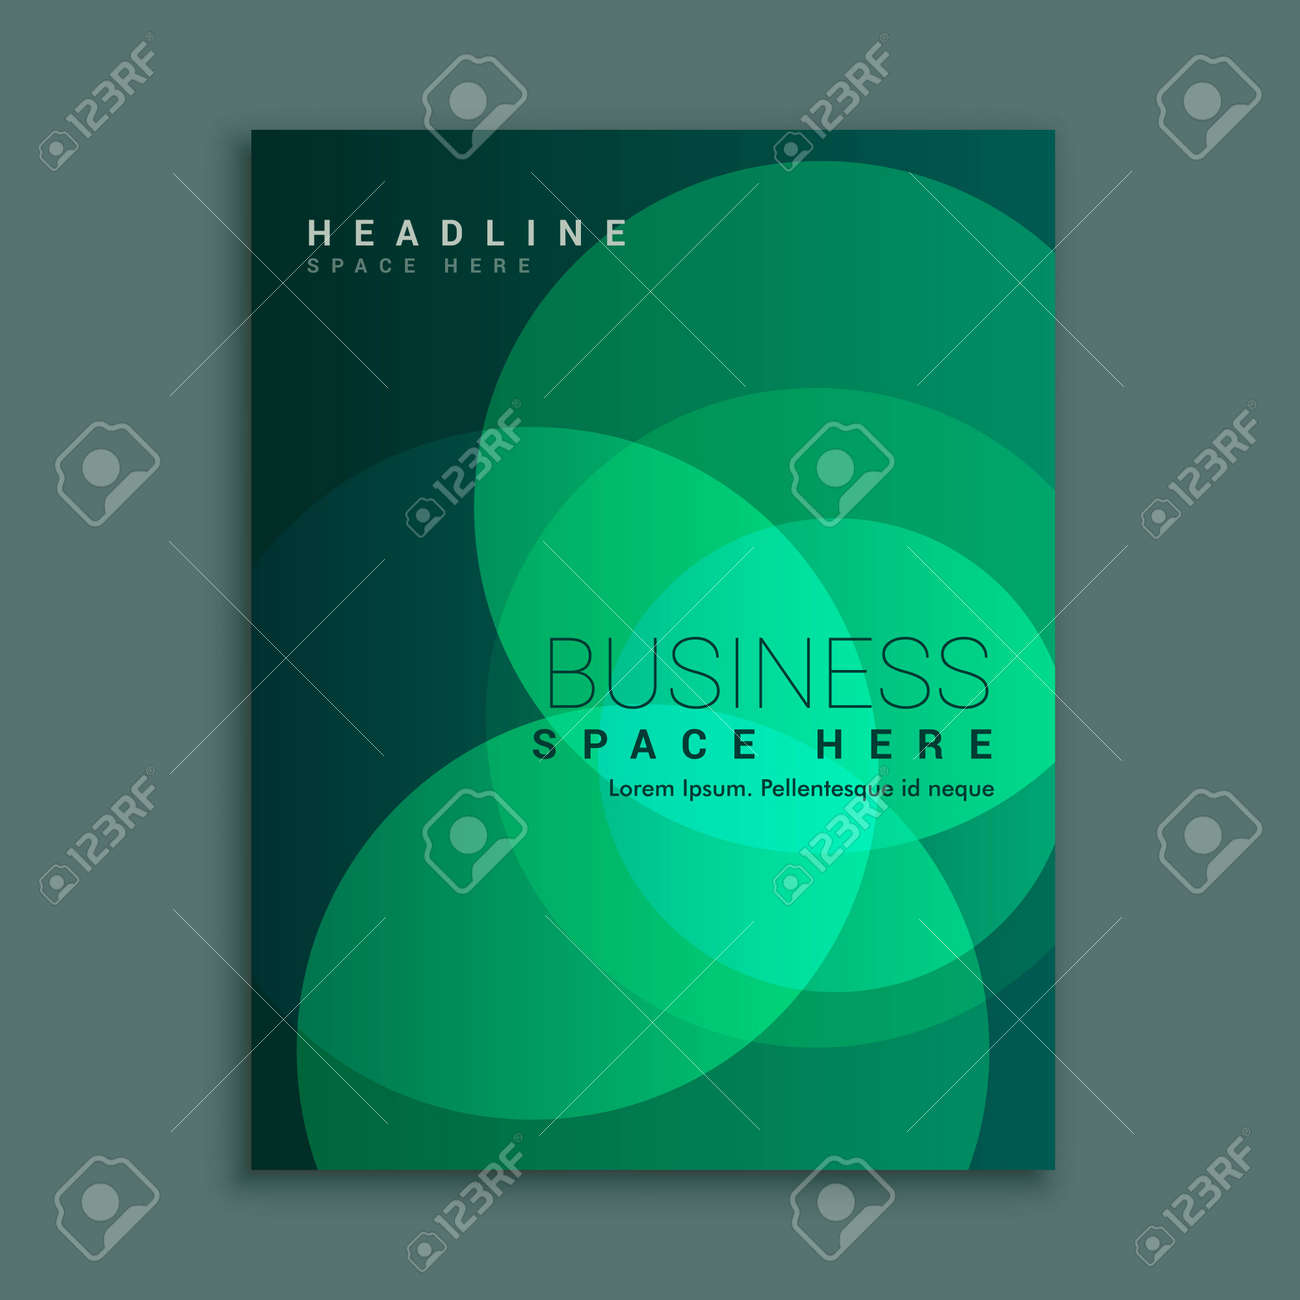 creative brochure flyer design with vibrant colors template design illustration - 149211263